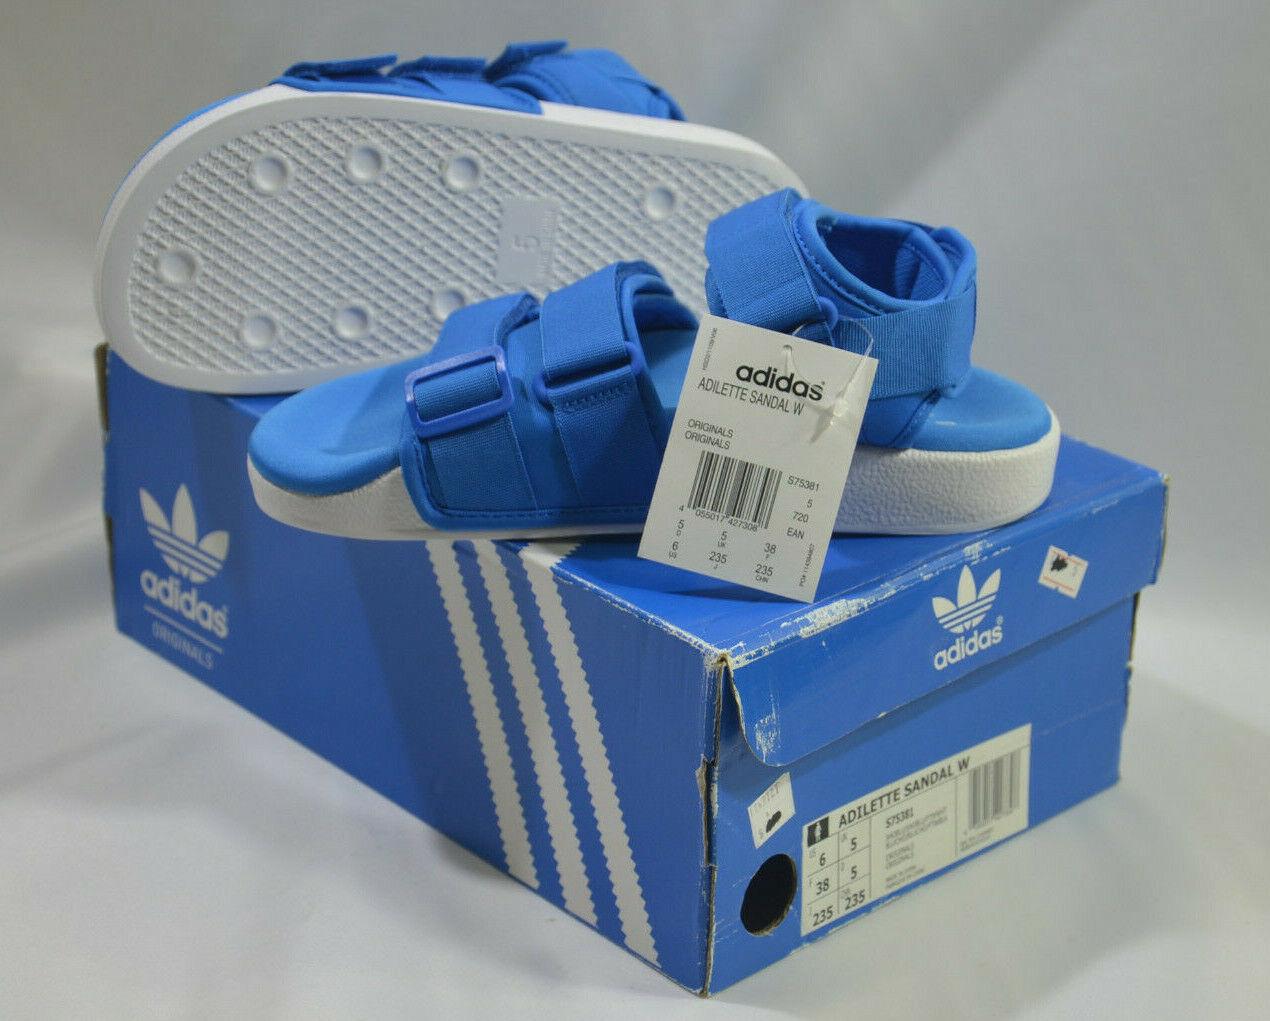 Nuevas Adidas Originales Para Mujer Adilette Sandalia W S75381 Azul EE. UU. 6 Reino Unido 5 J225 Slide